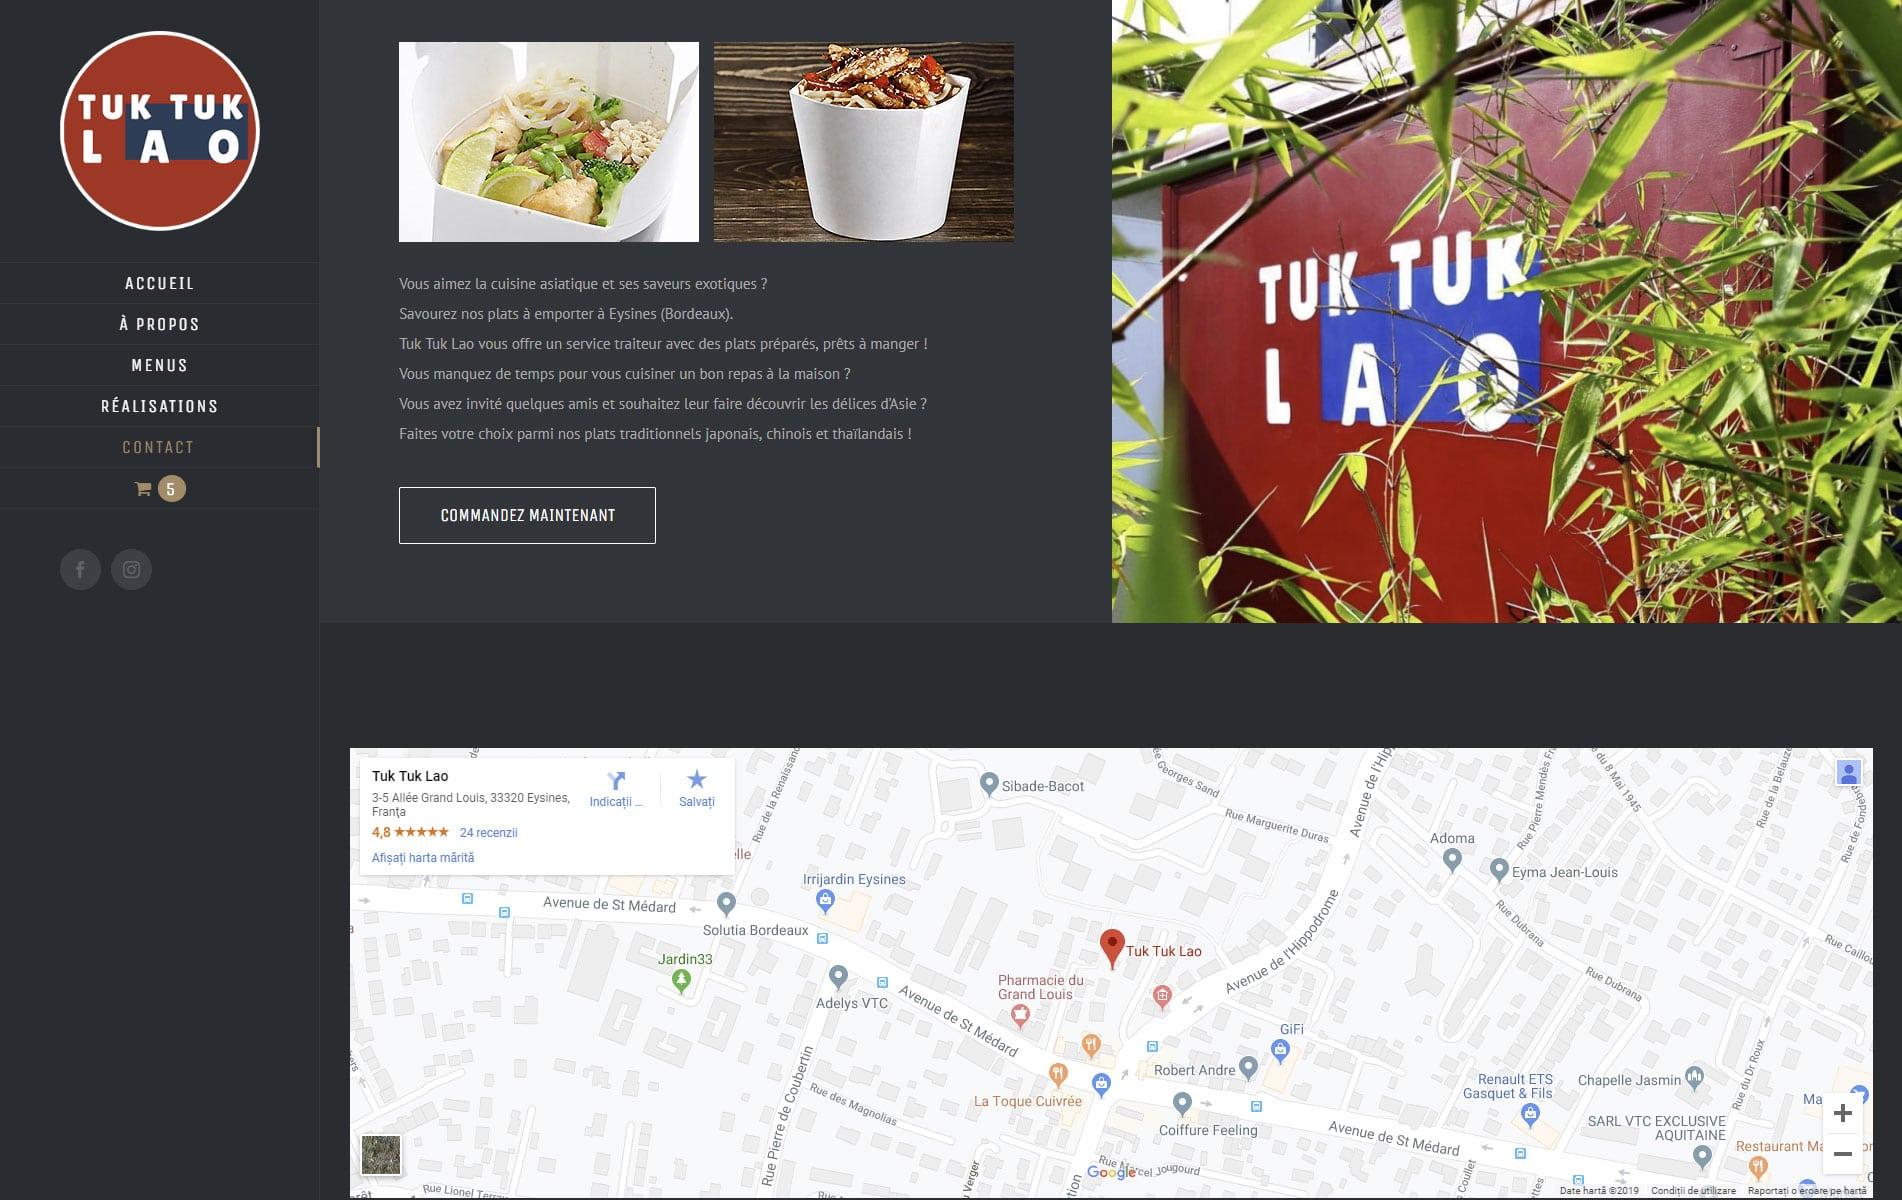 Tuk Tuk LAO - restaurant